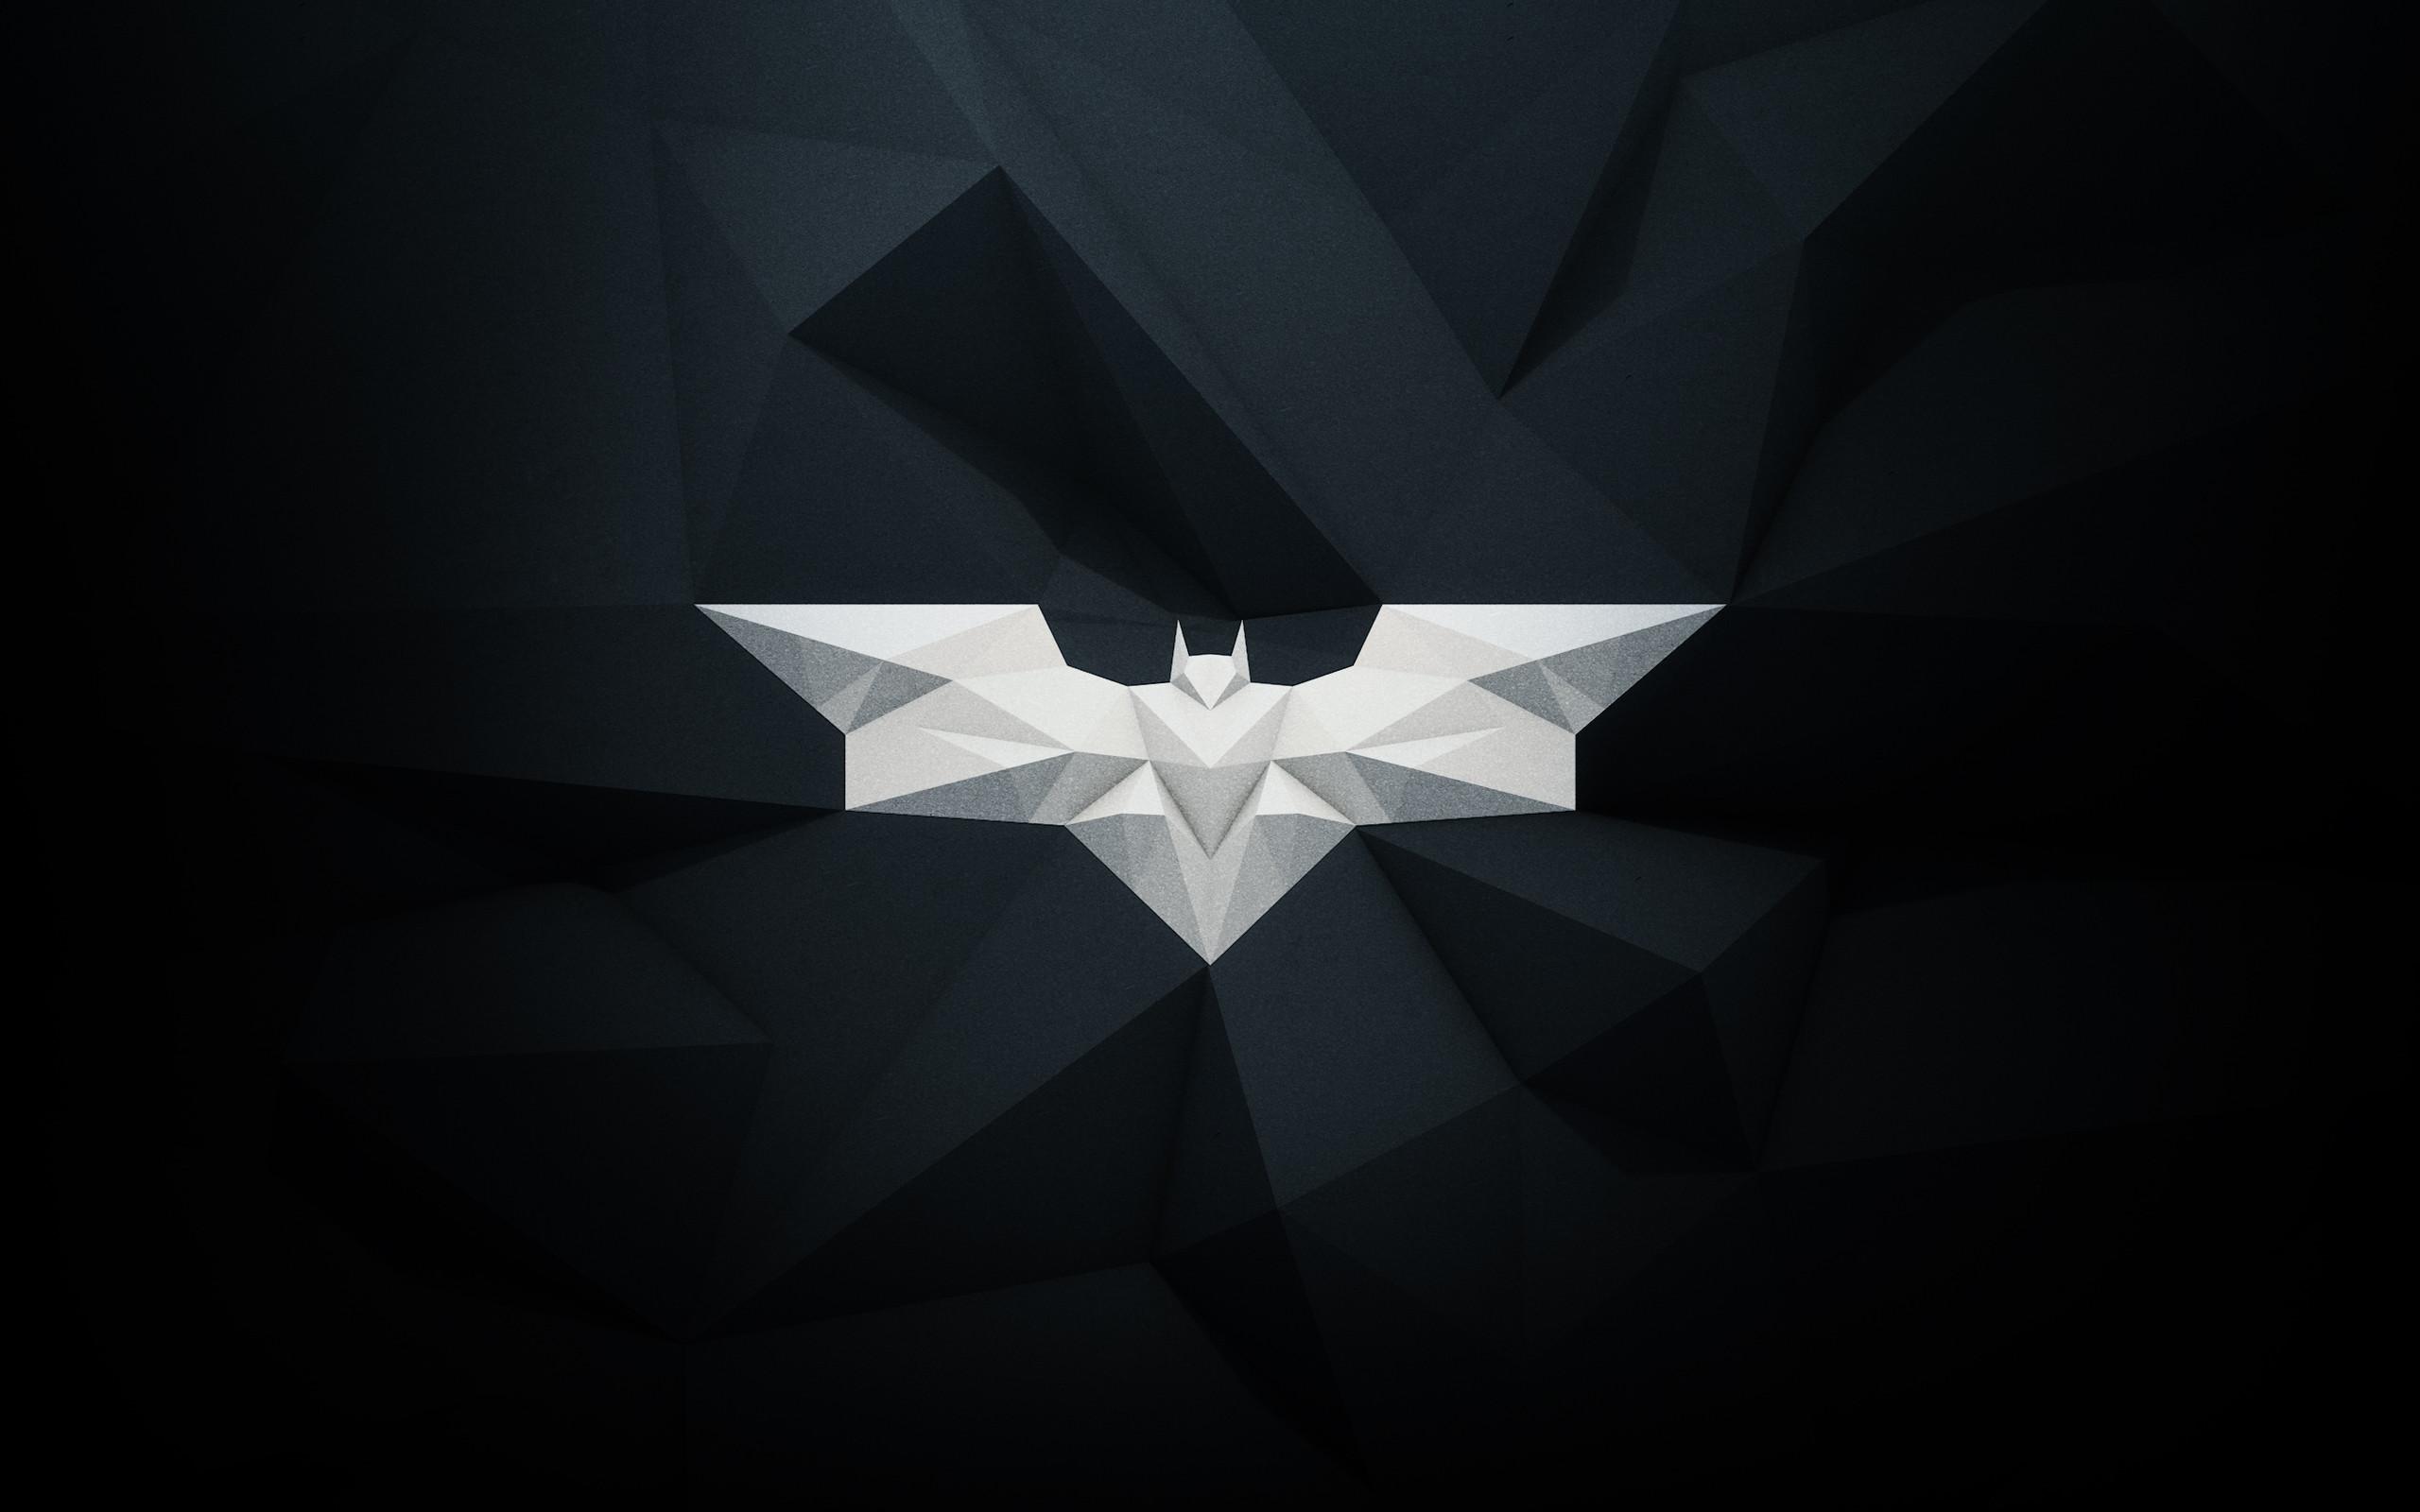 63 Batman Logo HD Wallpapers